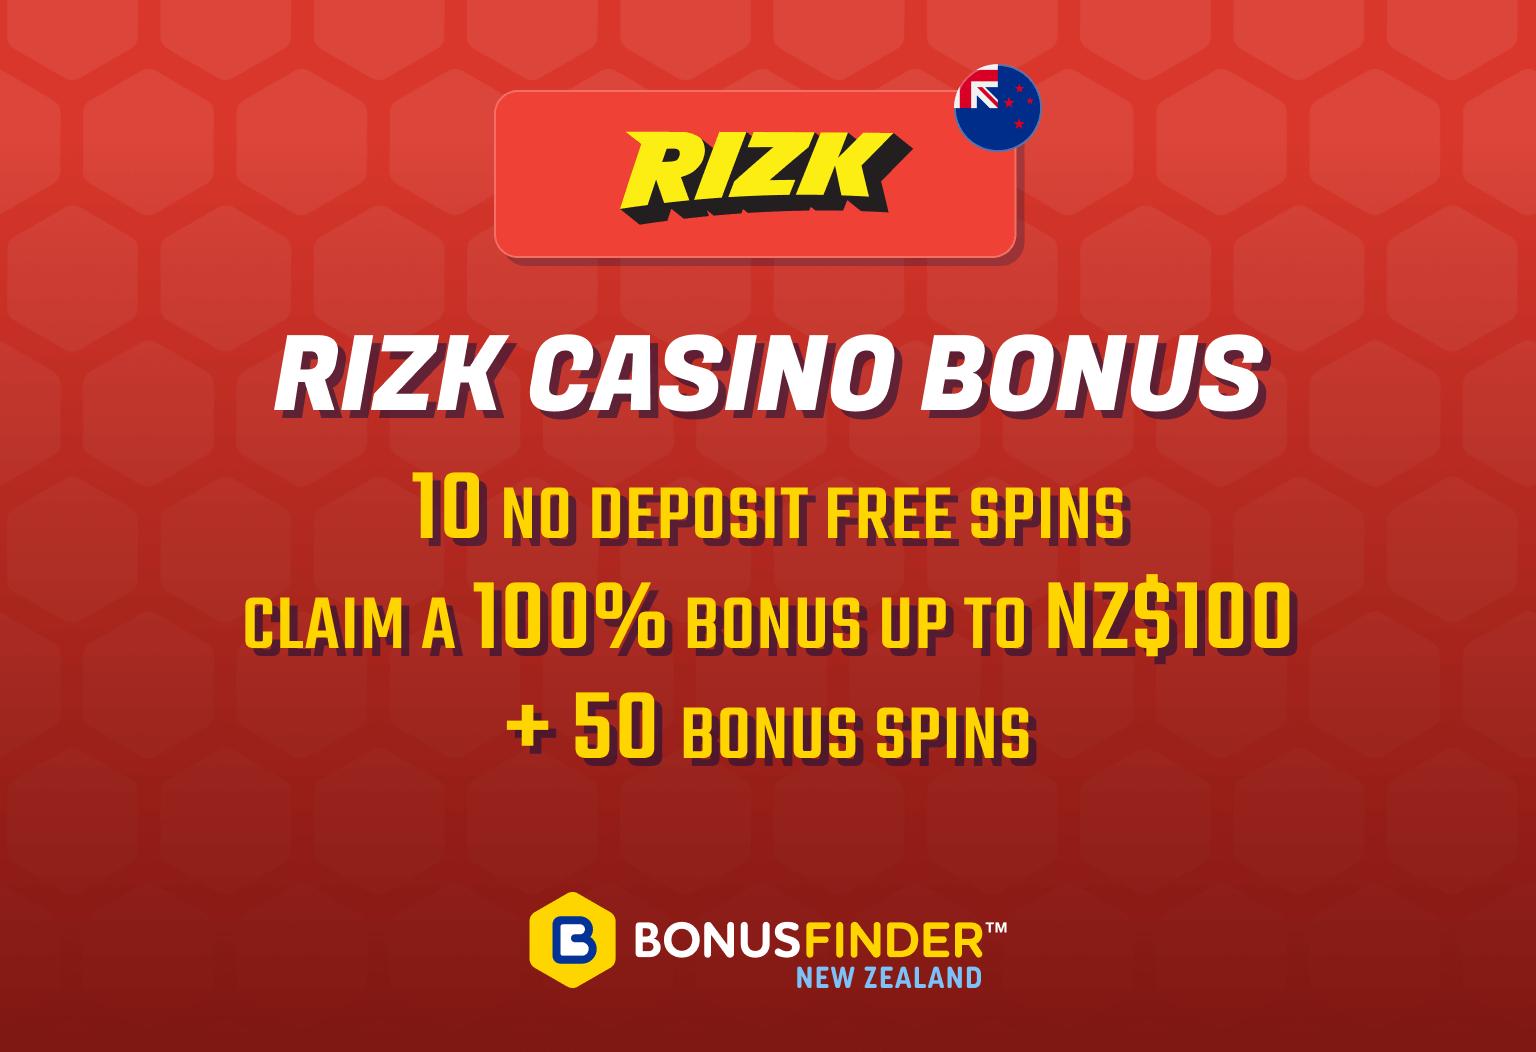 Rizk bonus